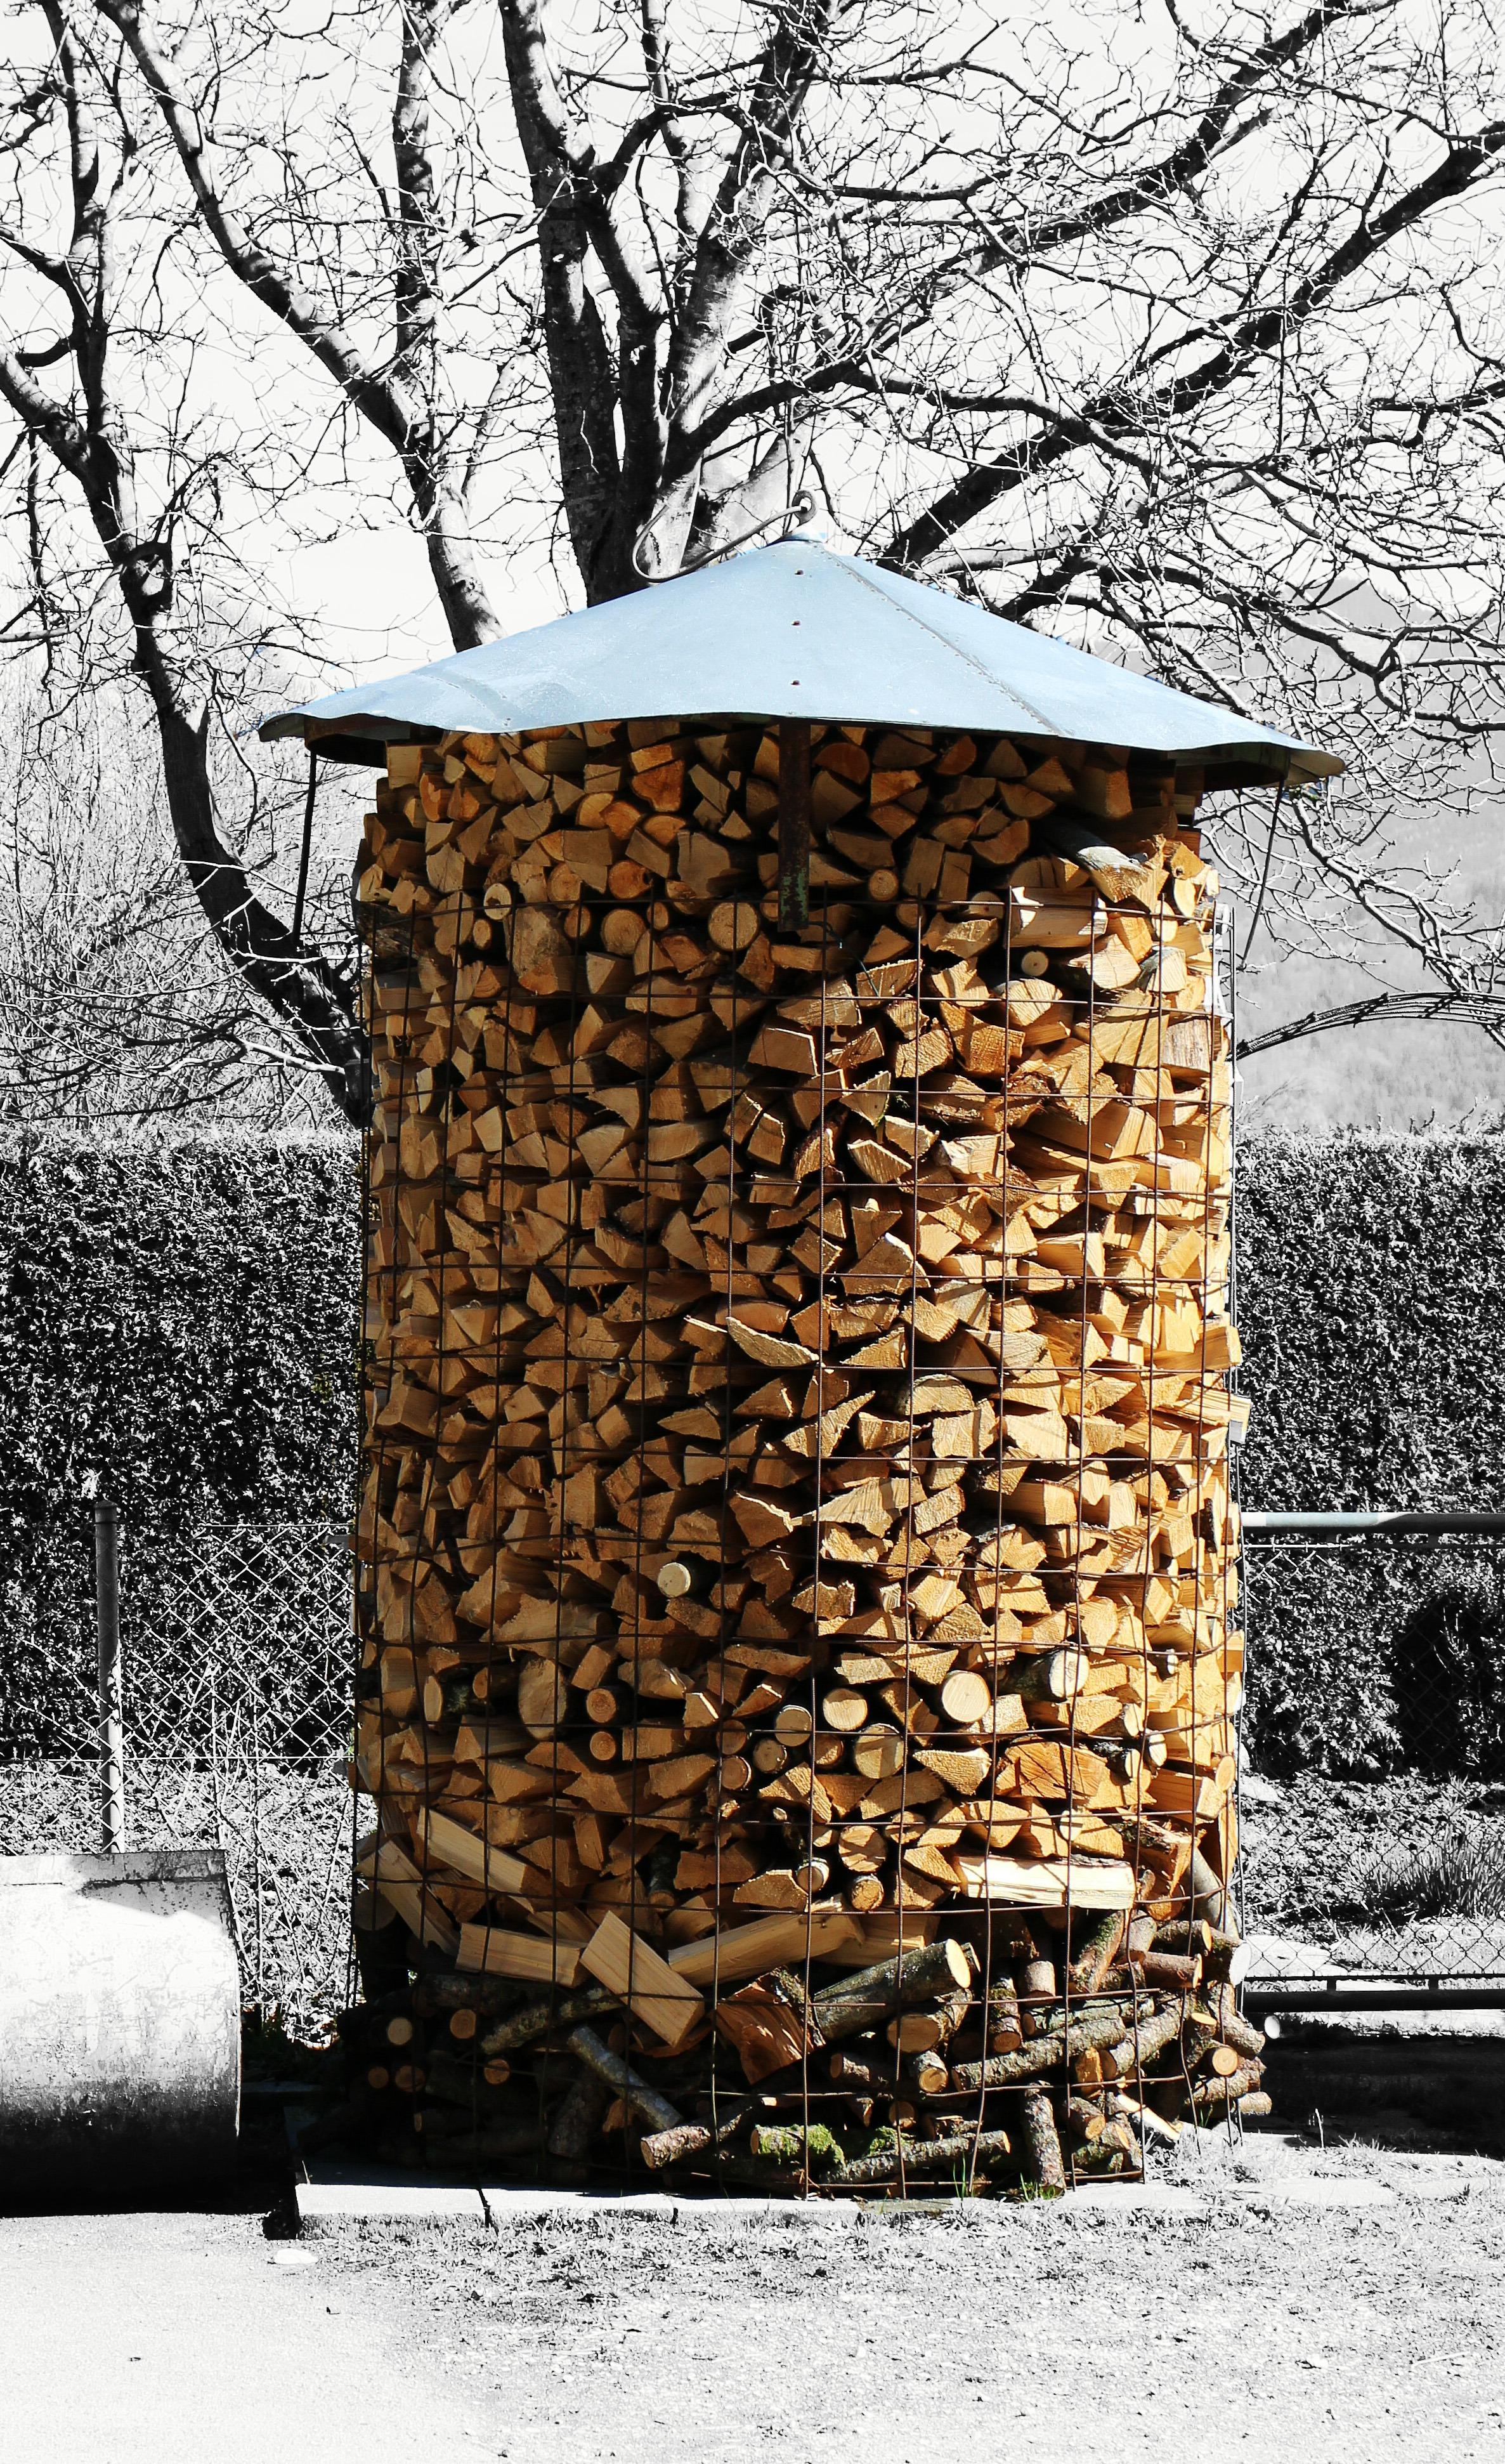 Free images tree snow winter wood autumn firewood